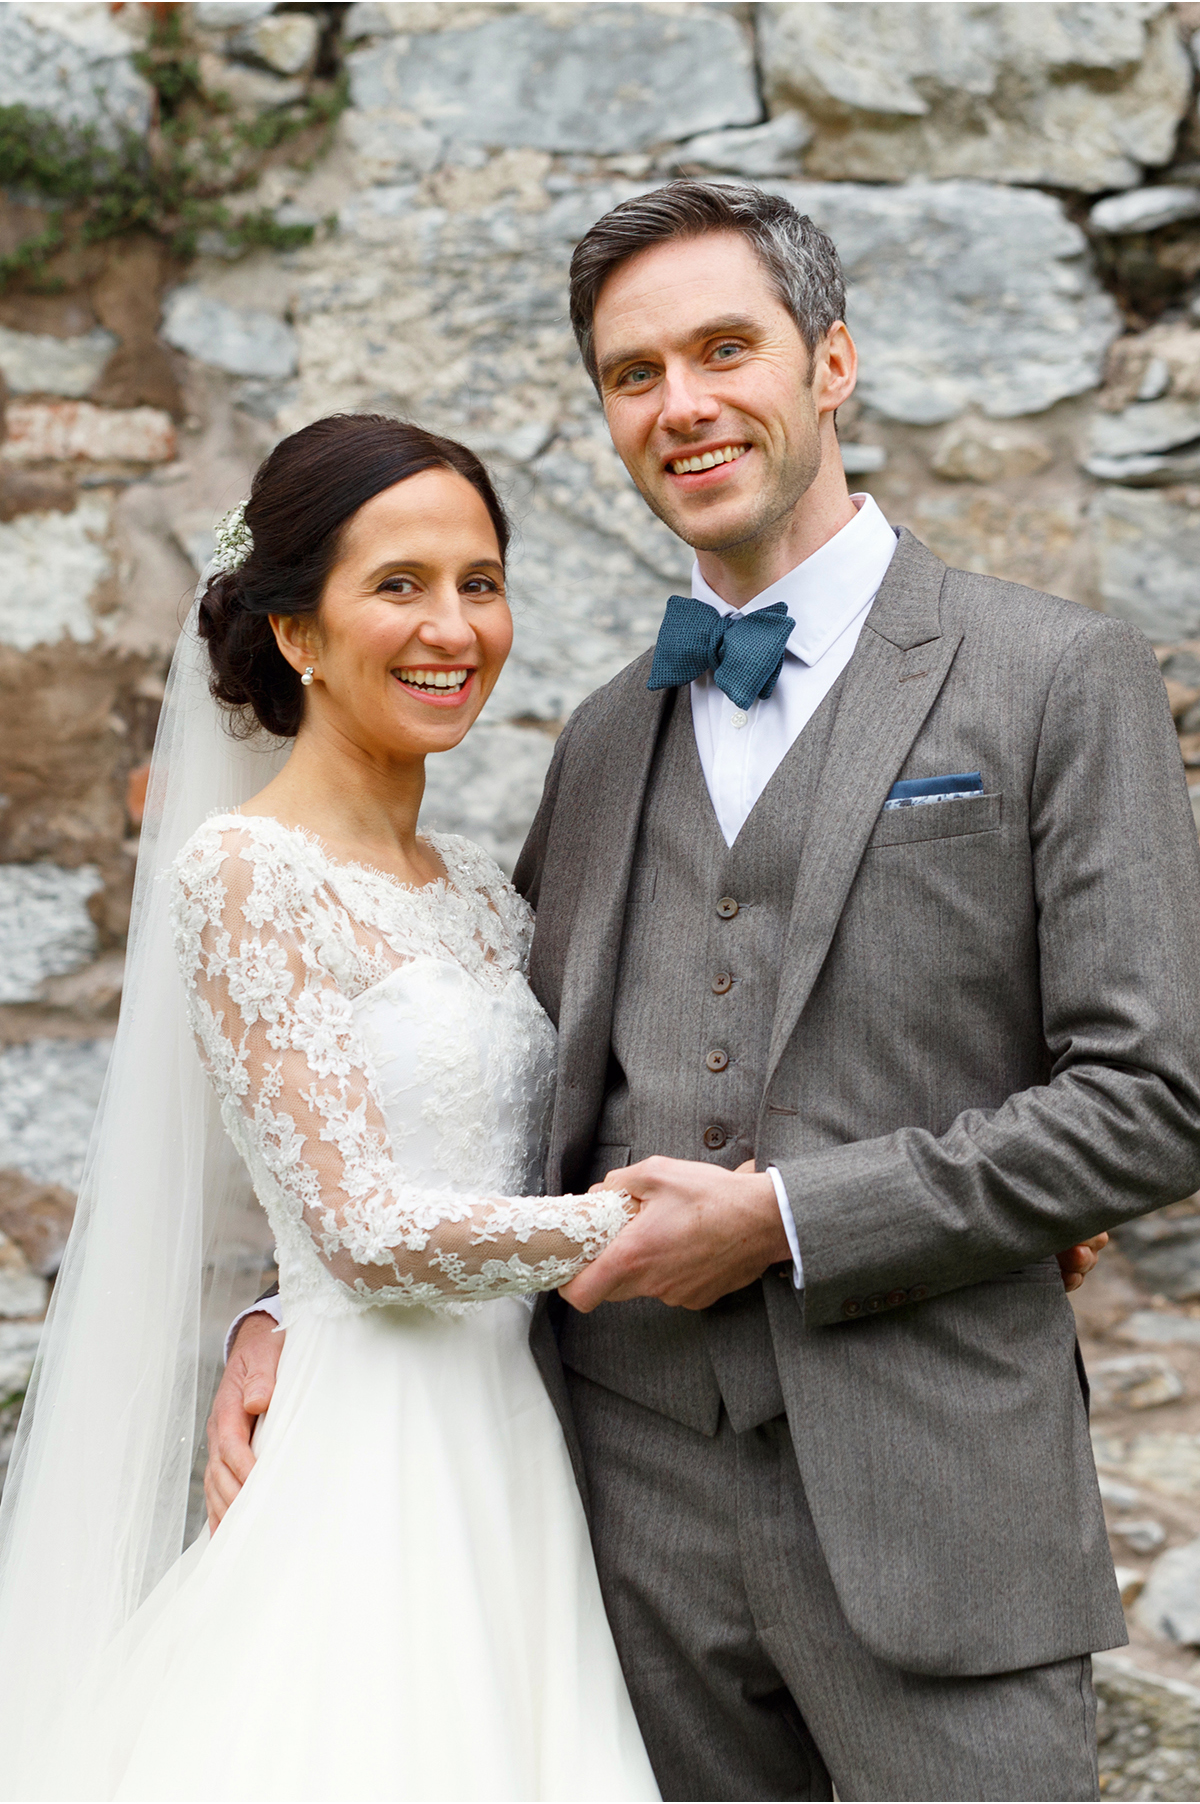 wedding photographs at Castlemartyr wedding